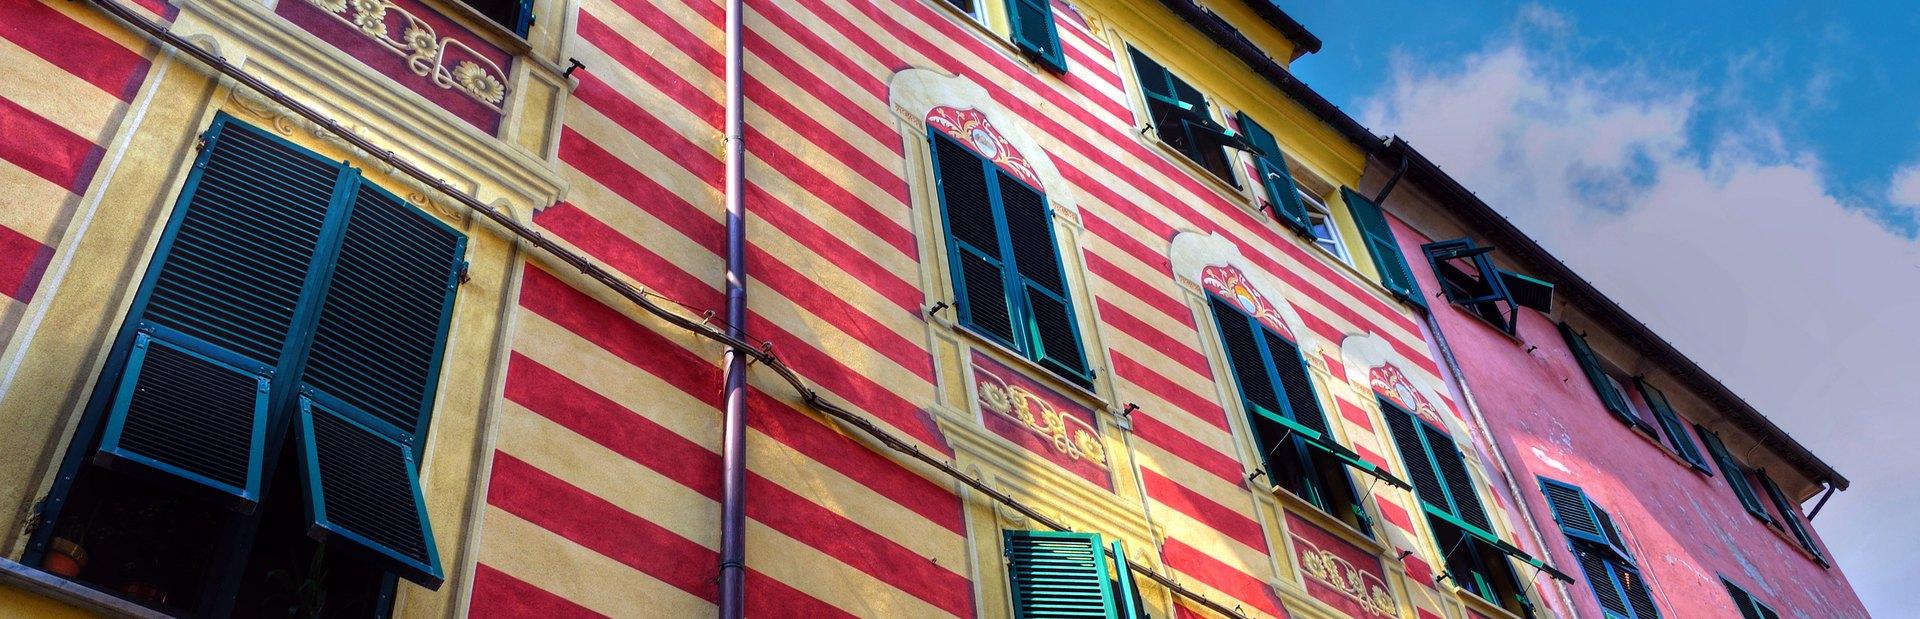 Portofino photo tour